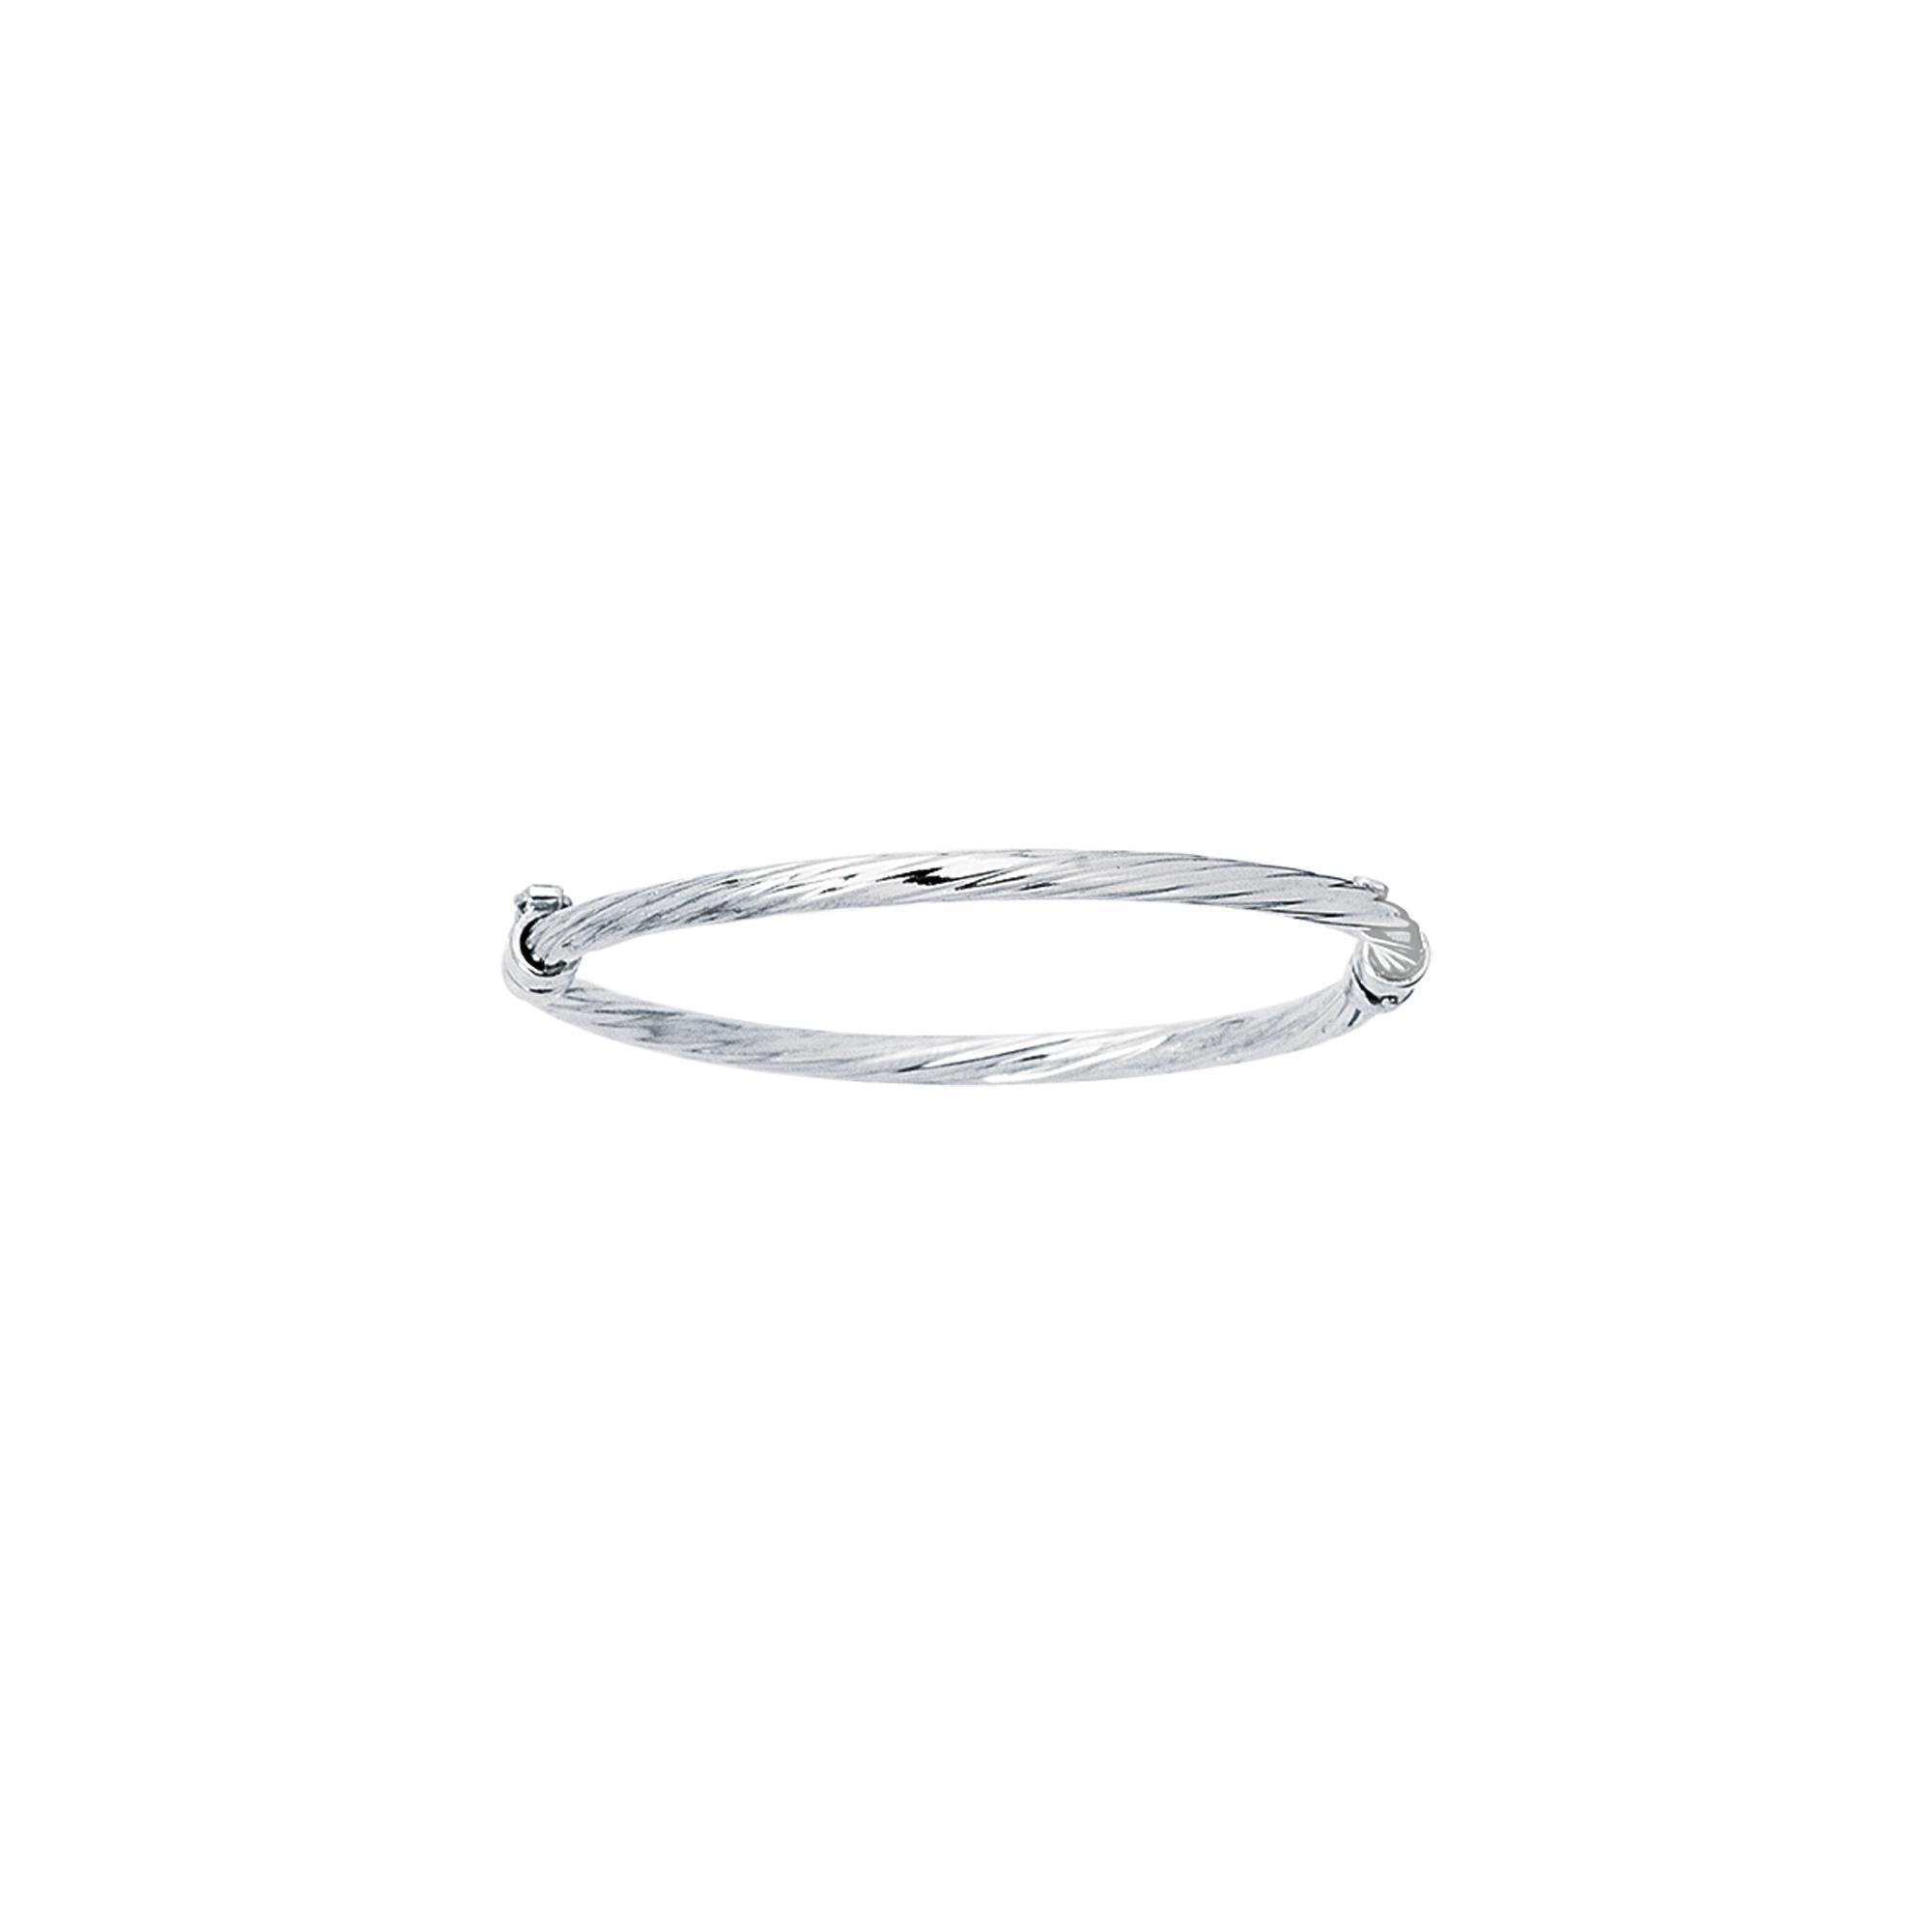 14k Yellow Gold 5.5 Inch Polish Finish Twist Girls Bangle Bracelet by Diamond Sphere (Image #1)